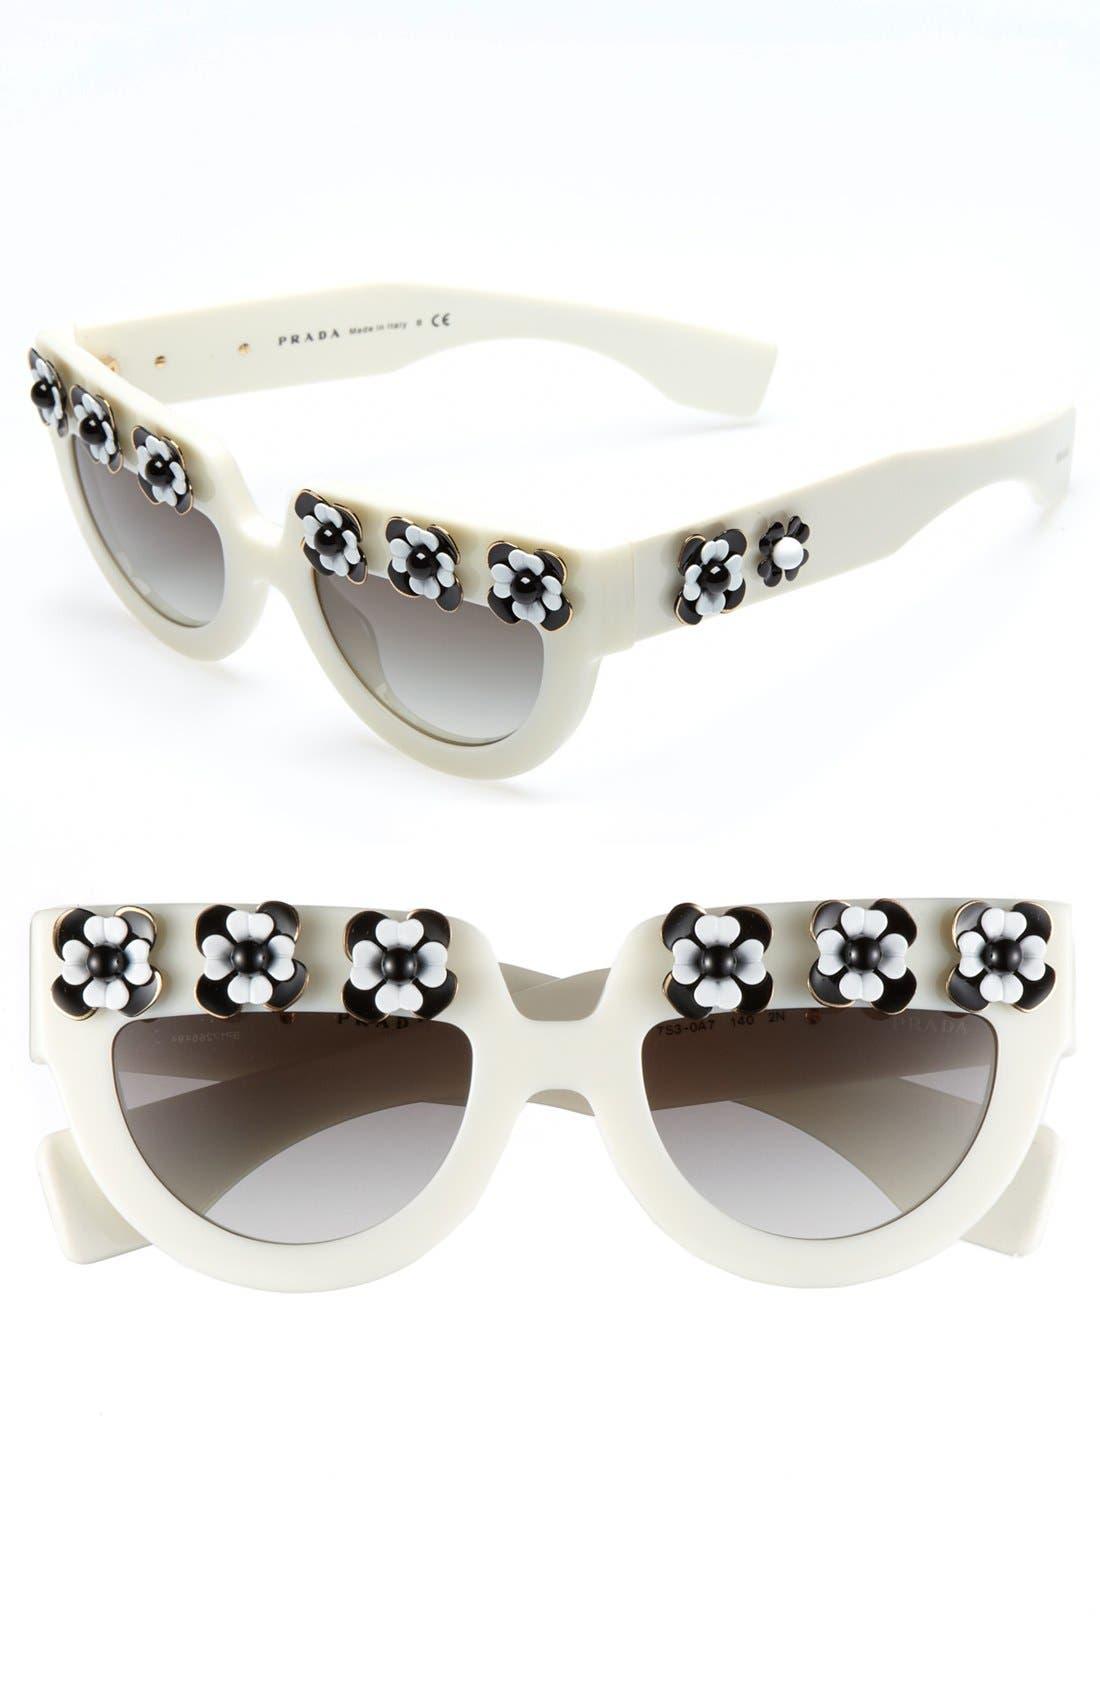 Main Image - Prada 'Irregular Flowers' 50mm Sunglasses